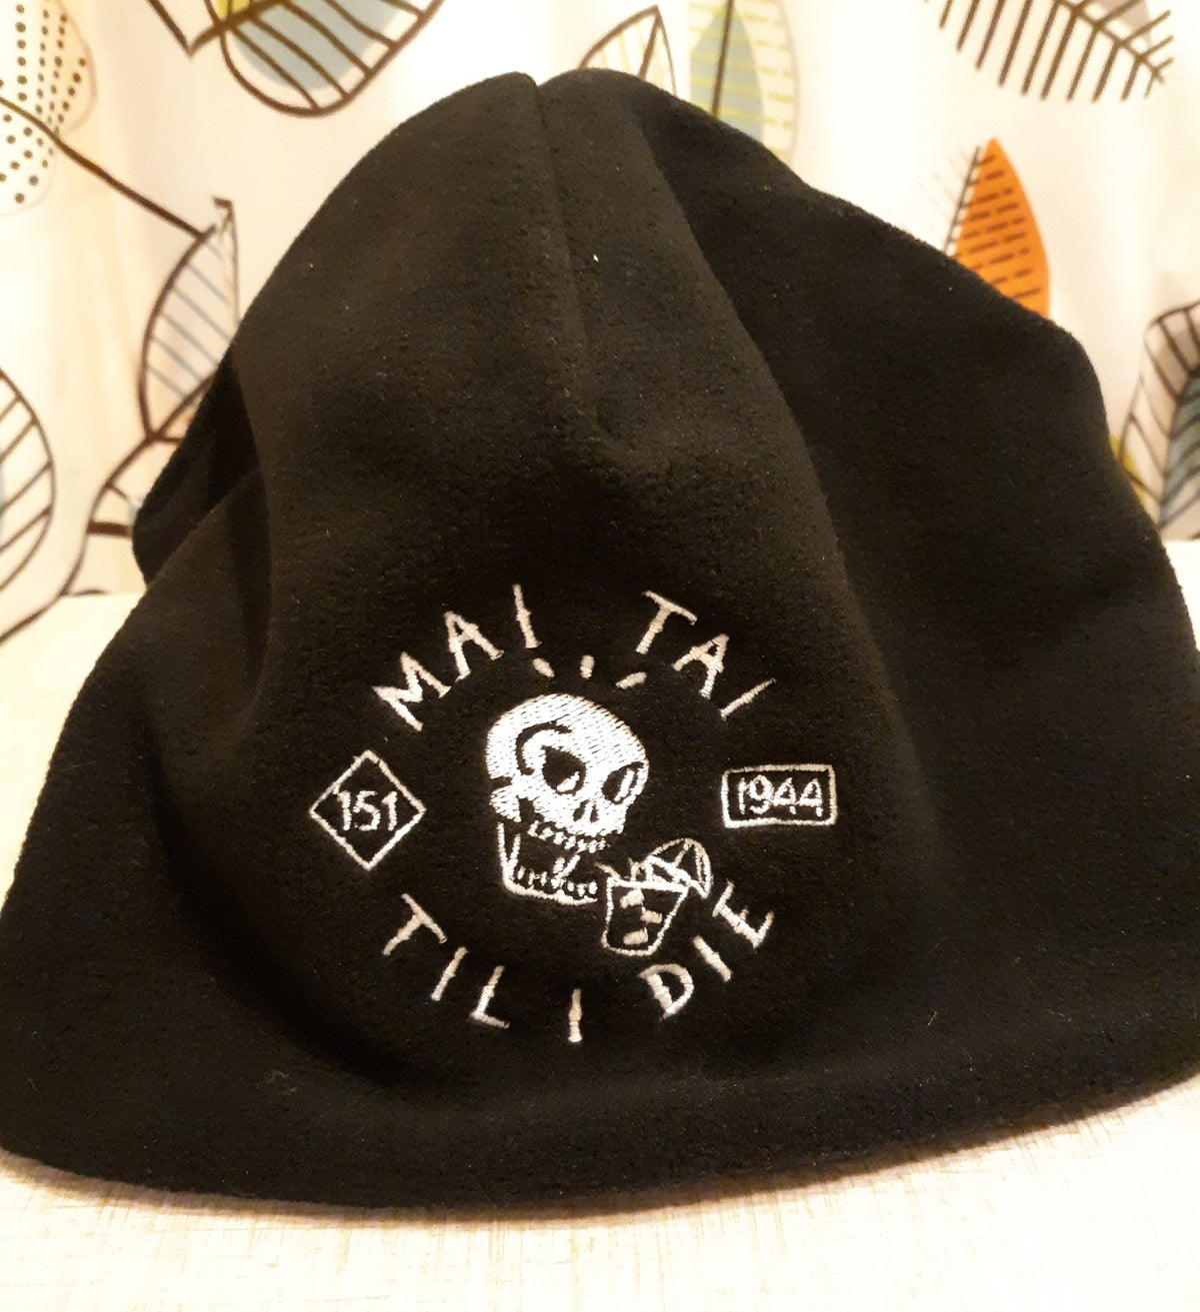 MAI TAI TIL I DIE Fleece Beanie Stocking Hat